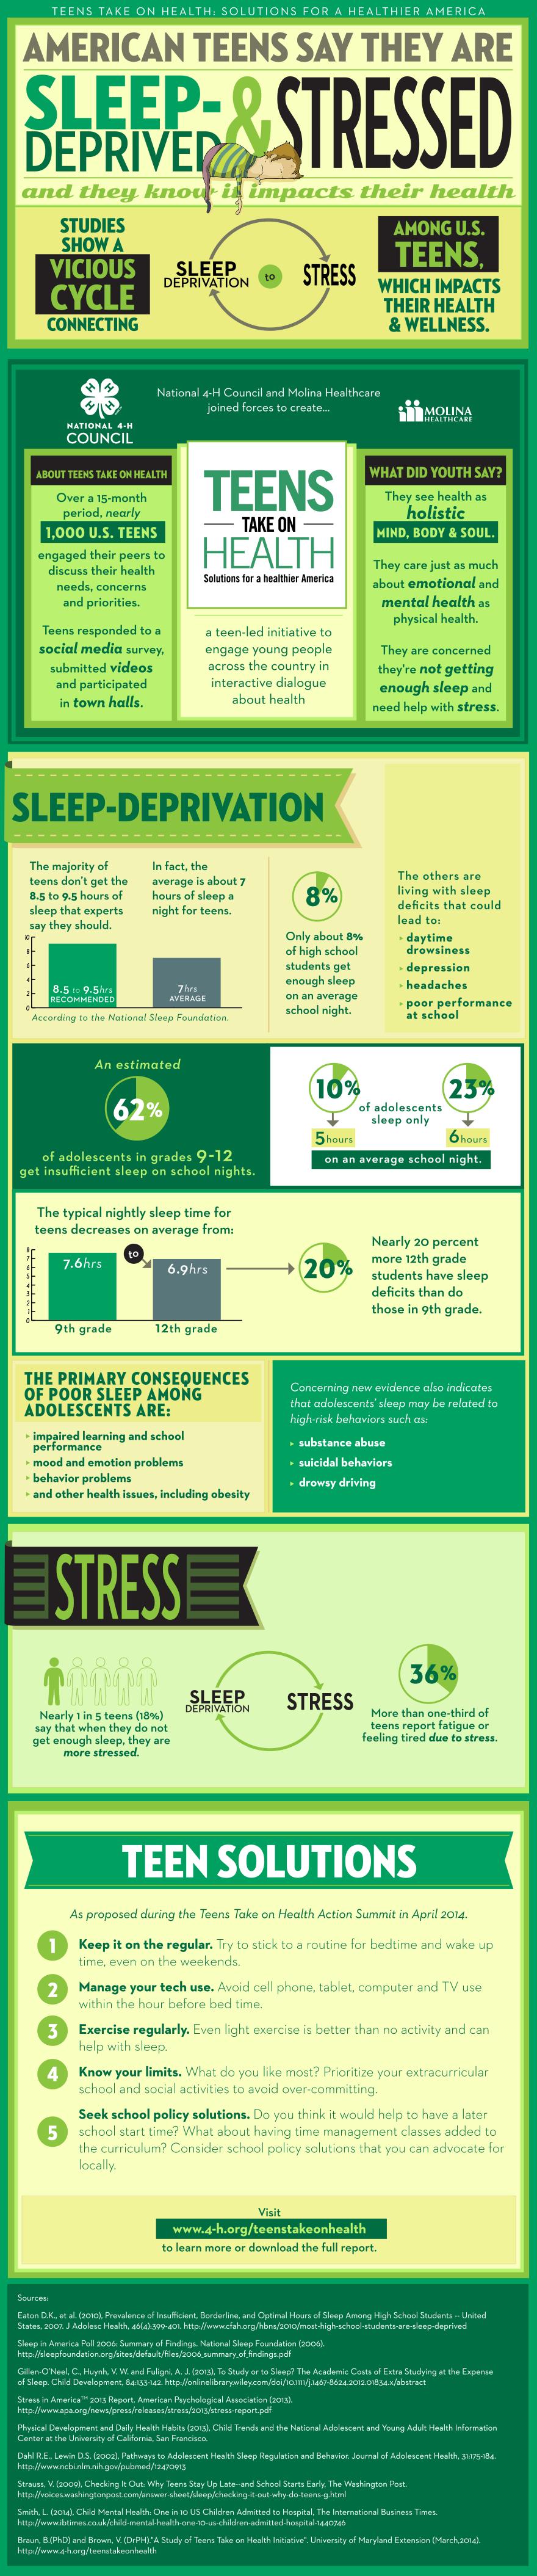 Teens Take on Health